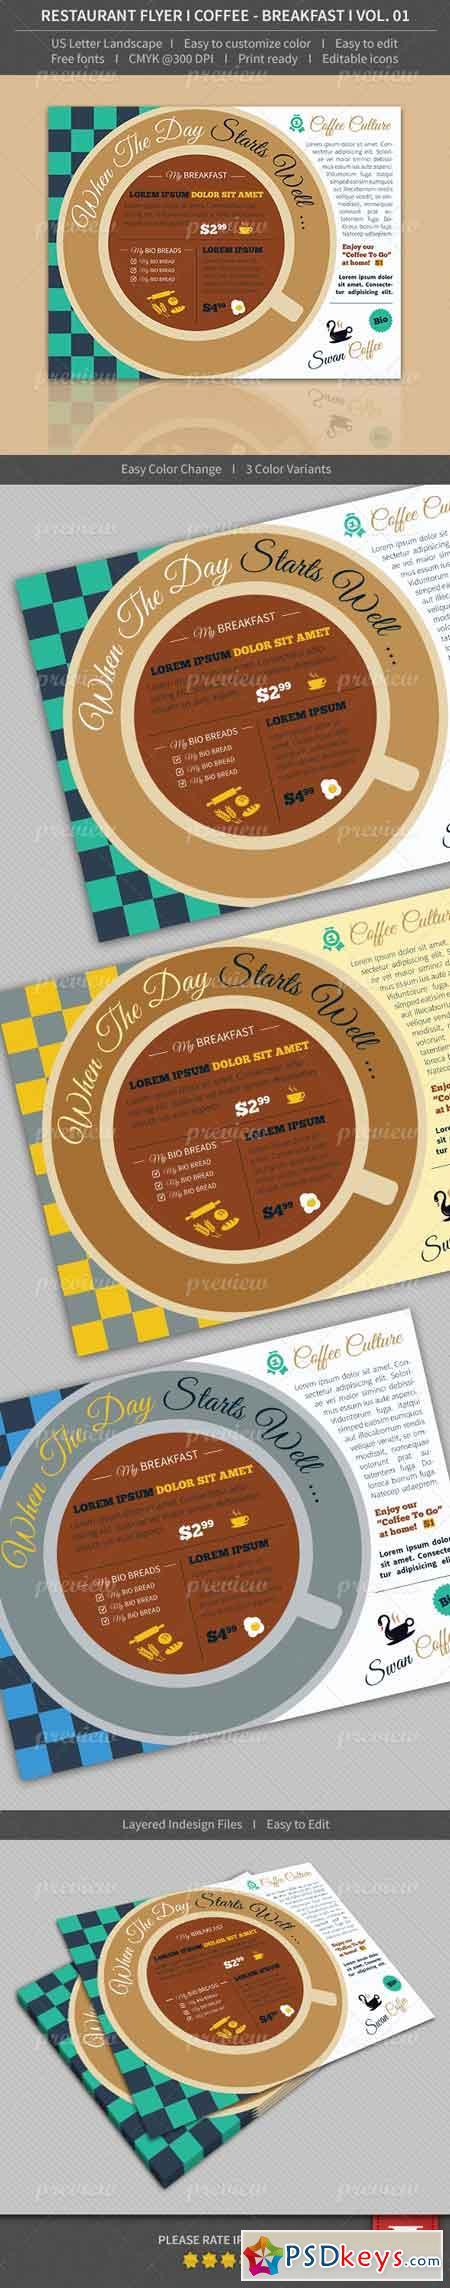 Restaurant Flyer - Coffee Breakfast - Volume 01 4114